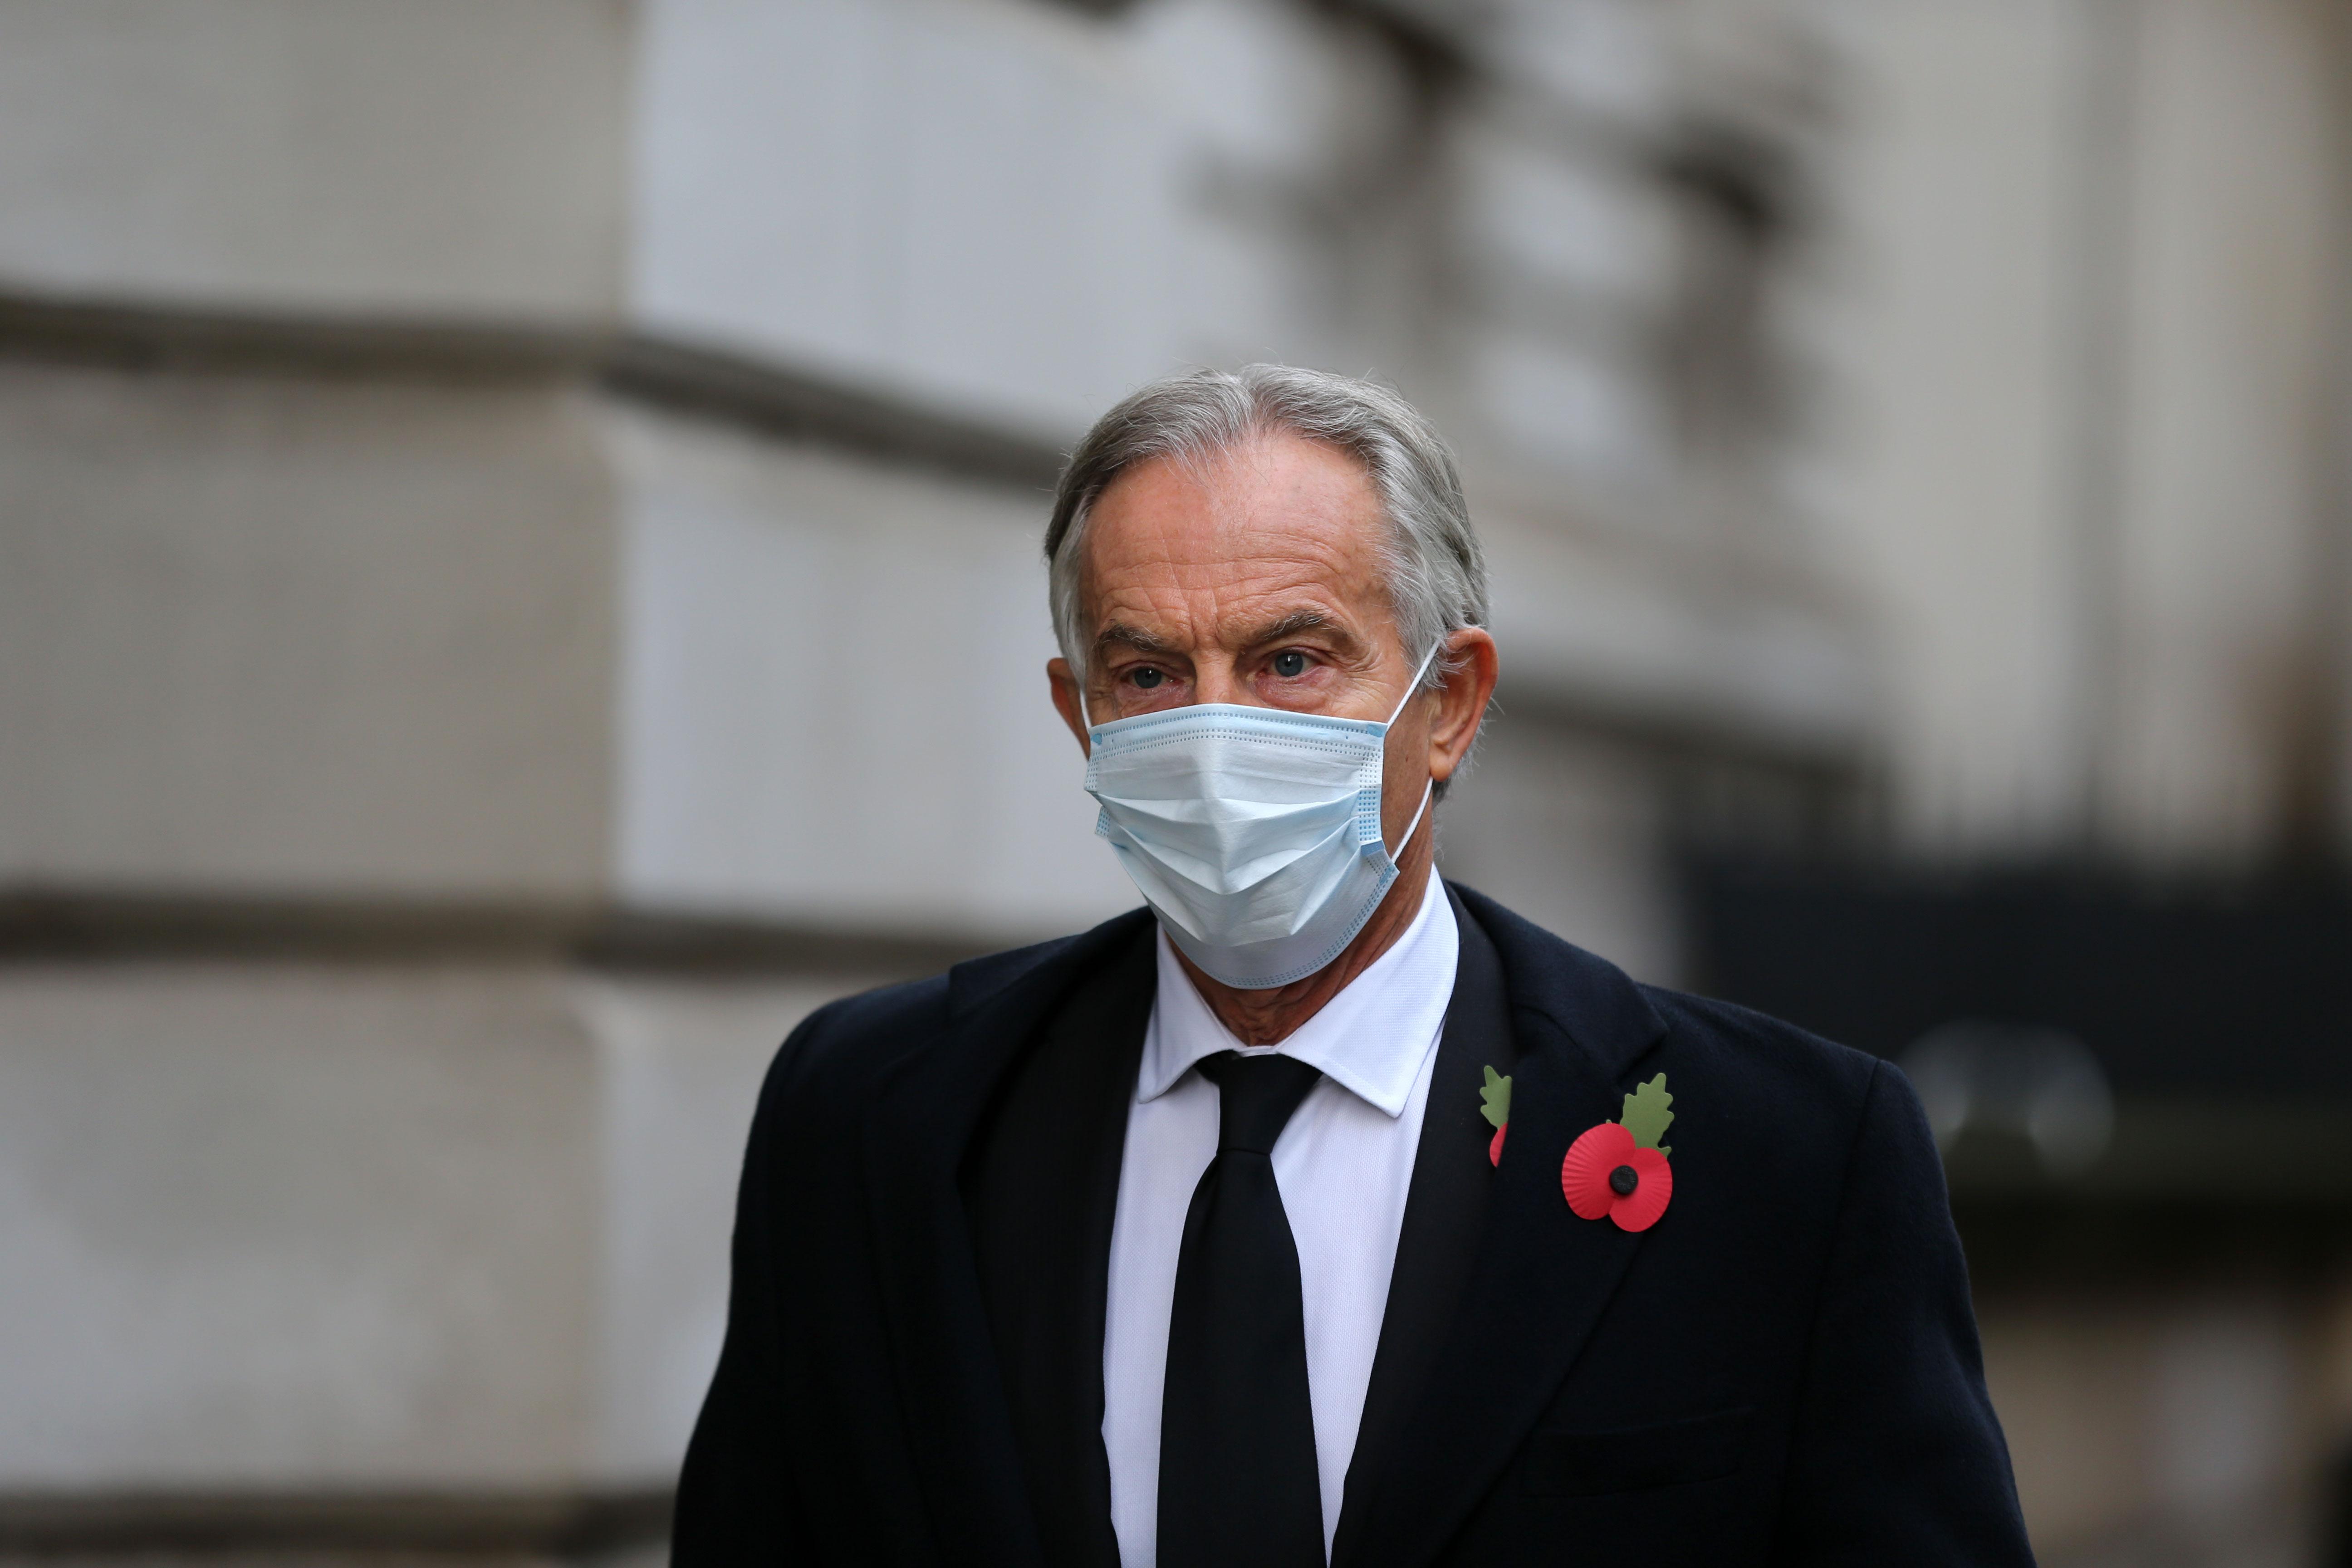 Former UK Prime Minister Tony Blair arrives at Downing Street in London on November 8, 2020.